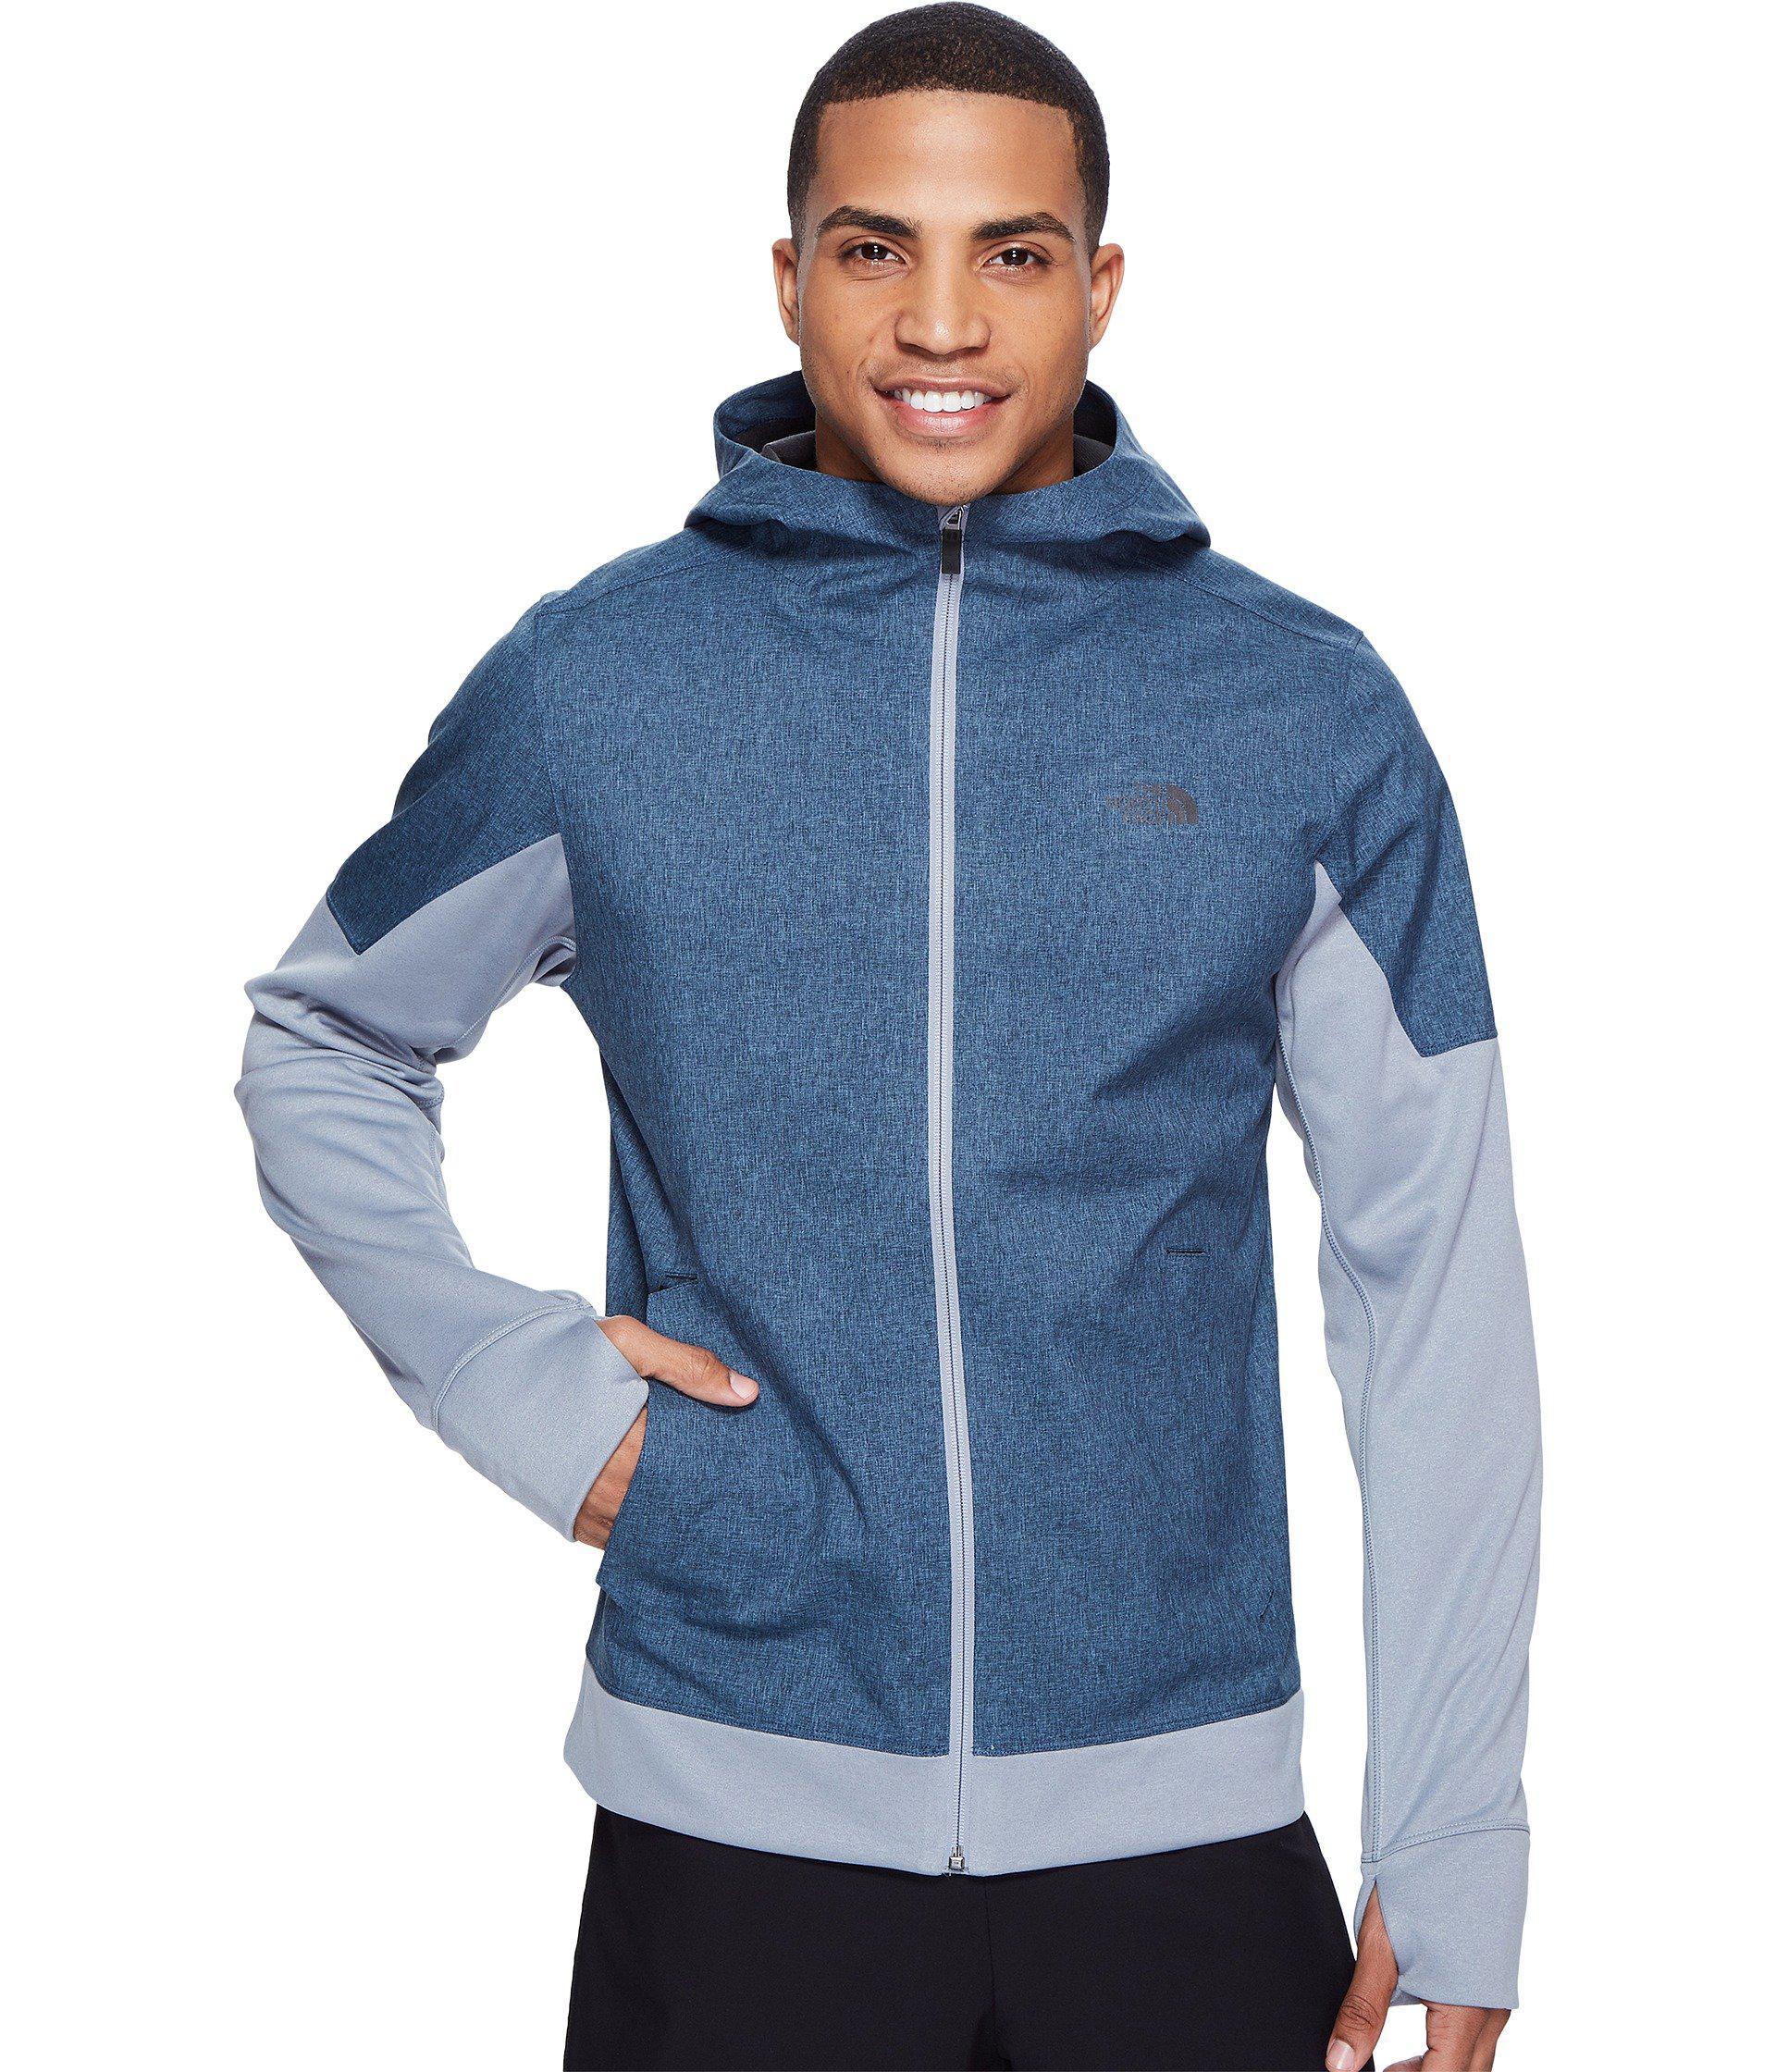 219e30550819 Lyst - The North Face Kilowatt Jacket in Blue for Men